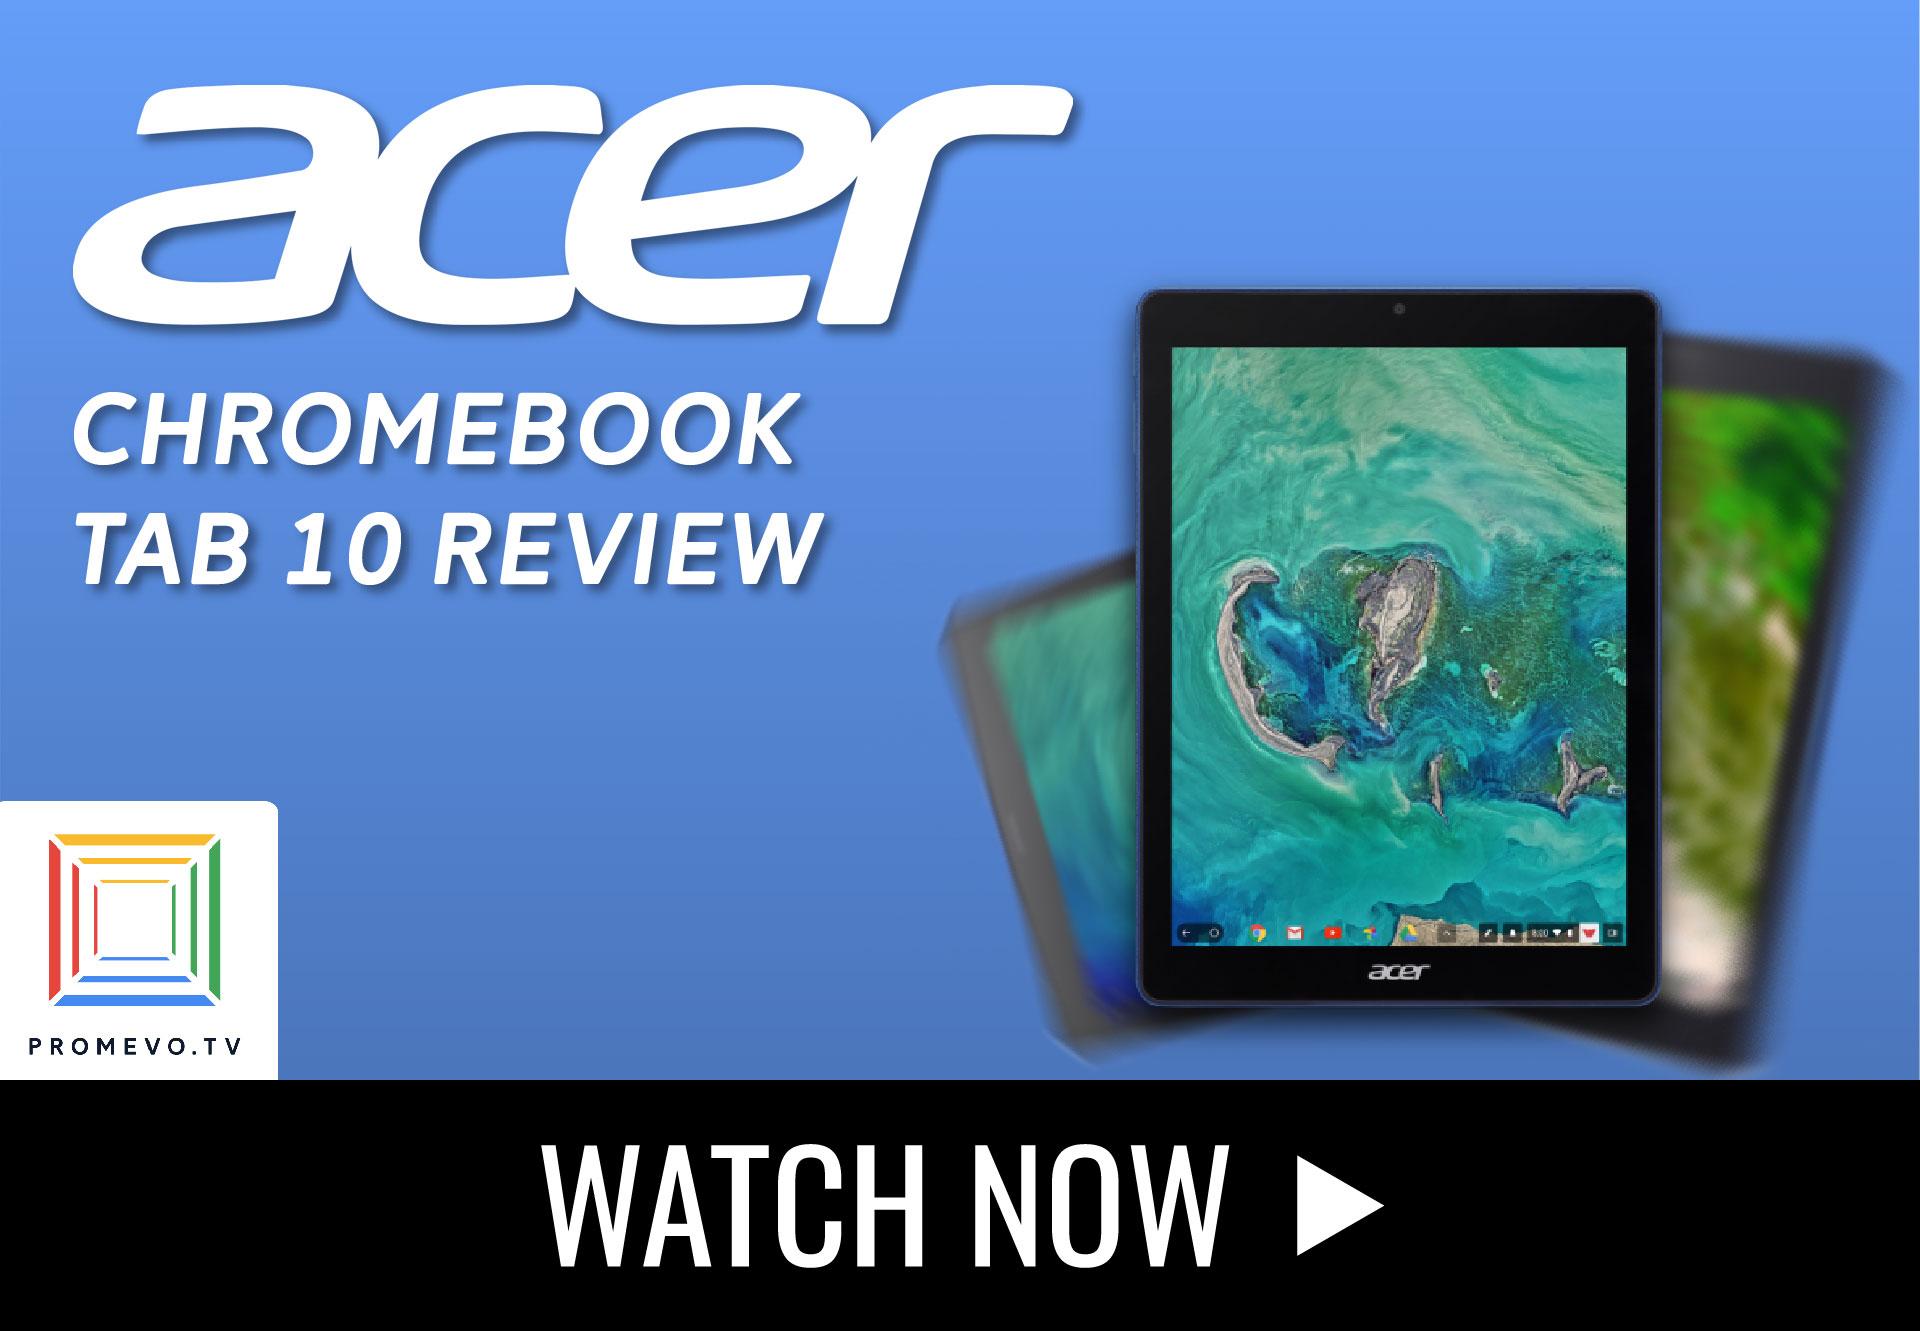 Promevo.TV Reviews: Acer Chromebook Tab 10